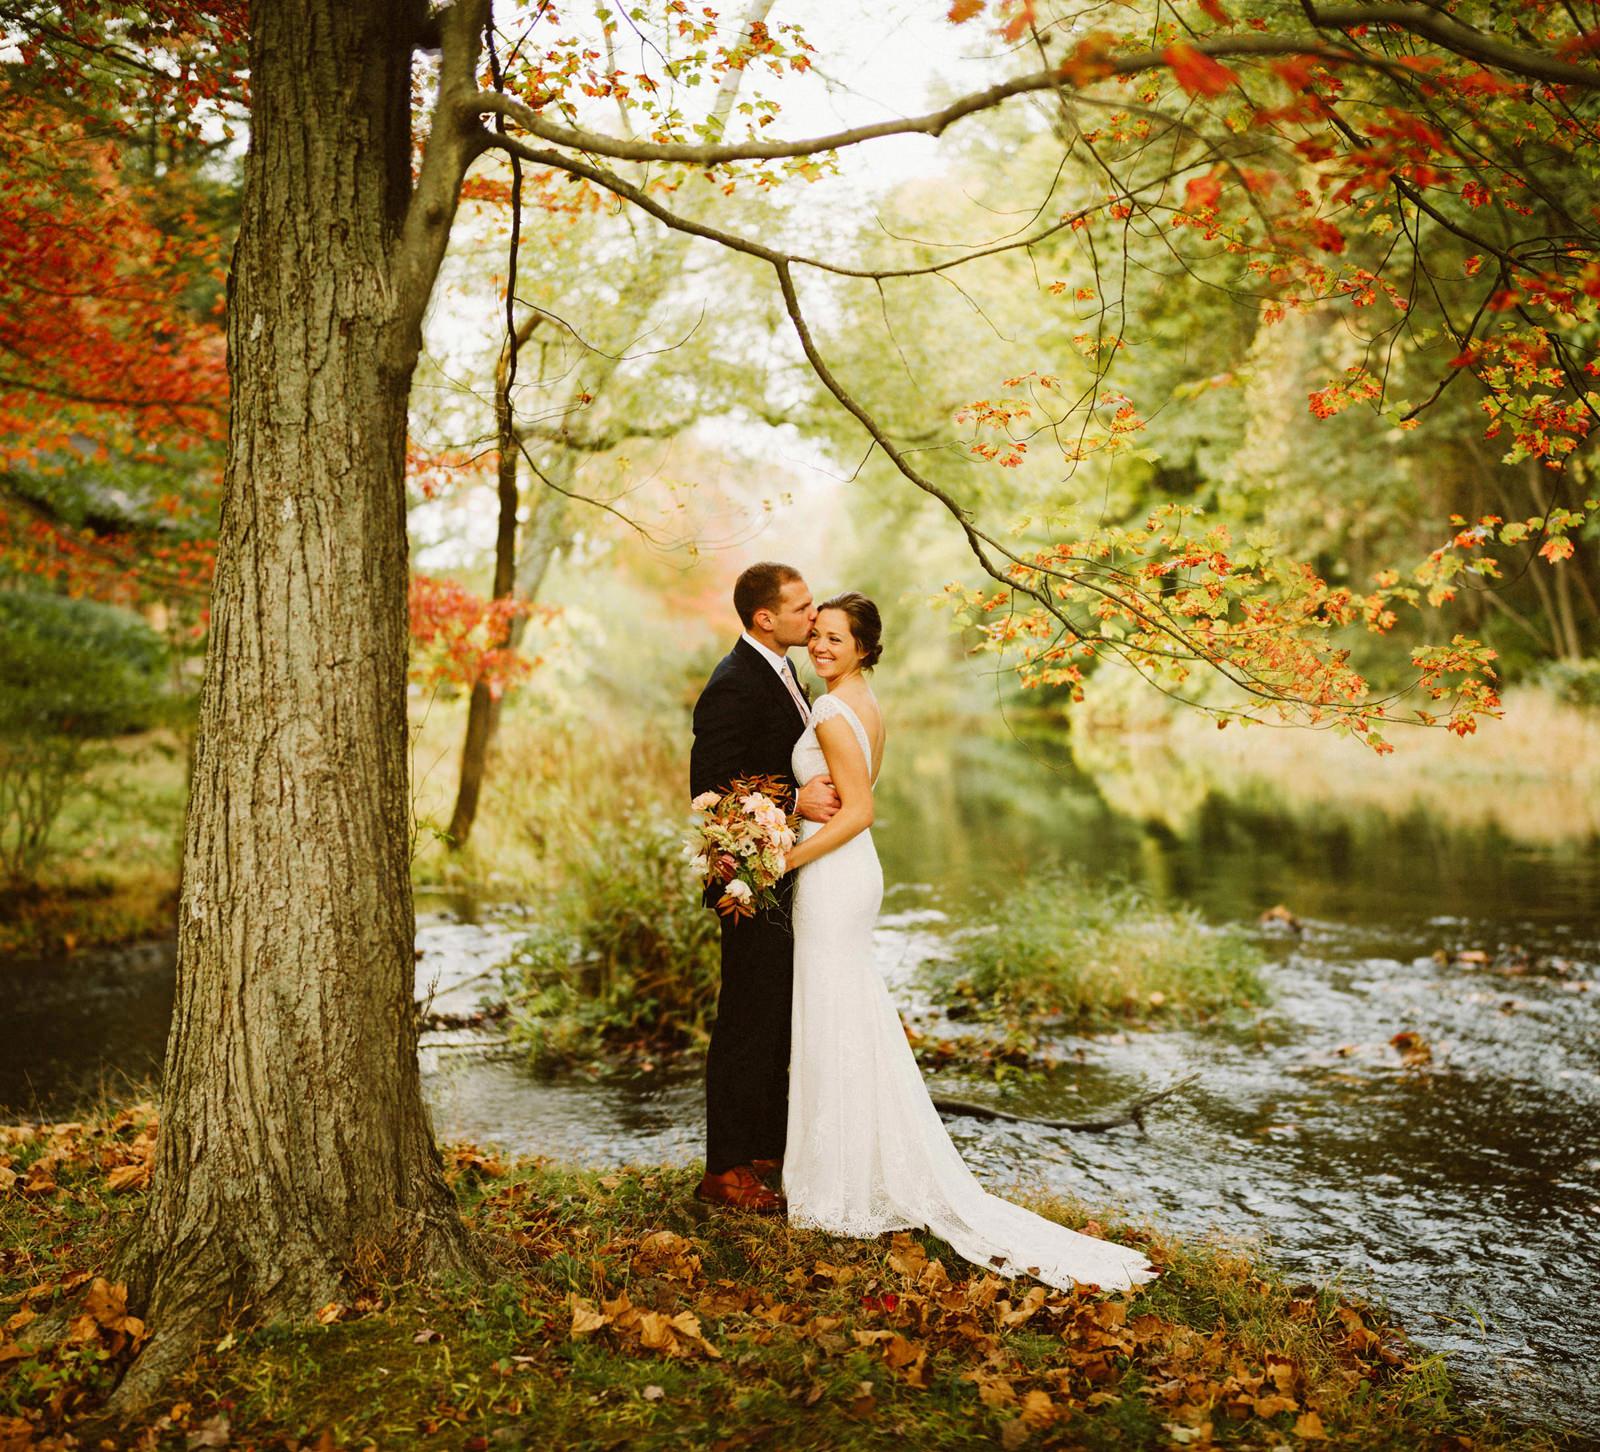 bridgeport-wedding-103 BRIDGEPORT, CONNECTICUT BACKYARD WEDDING